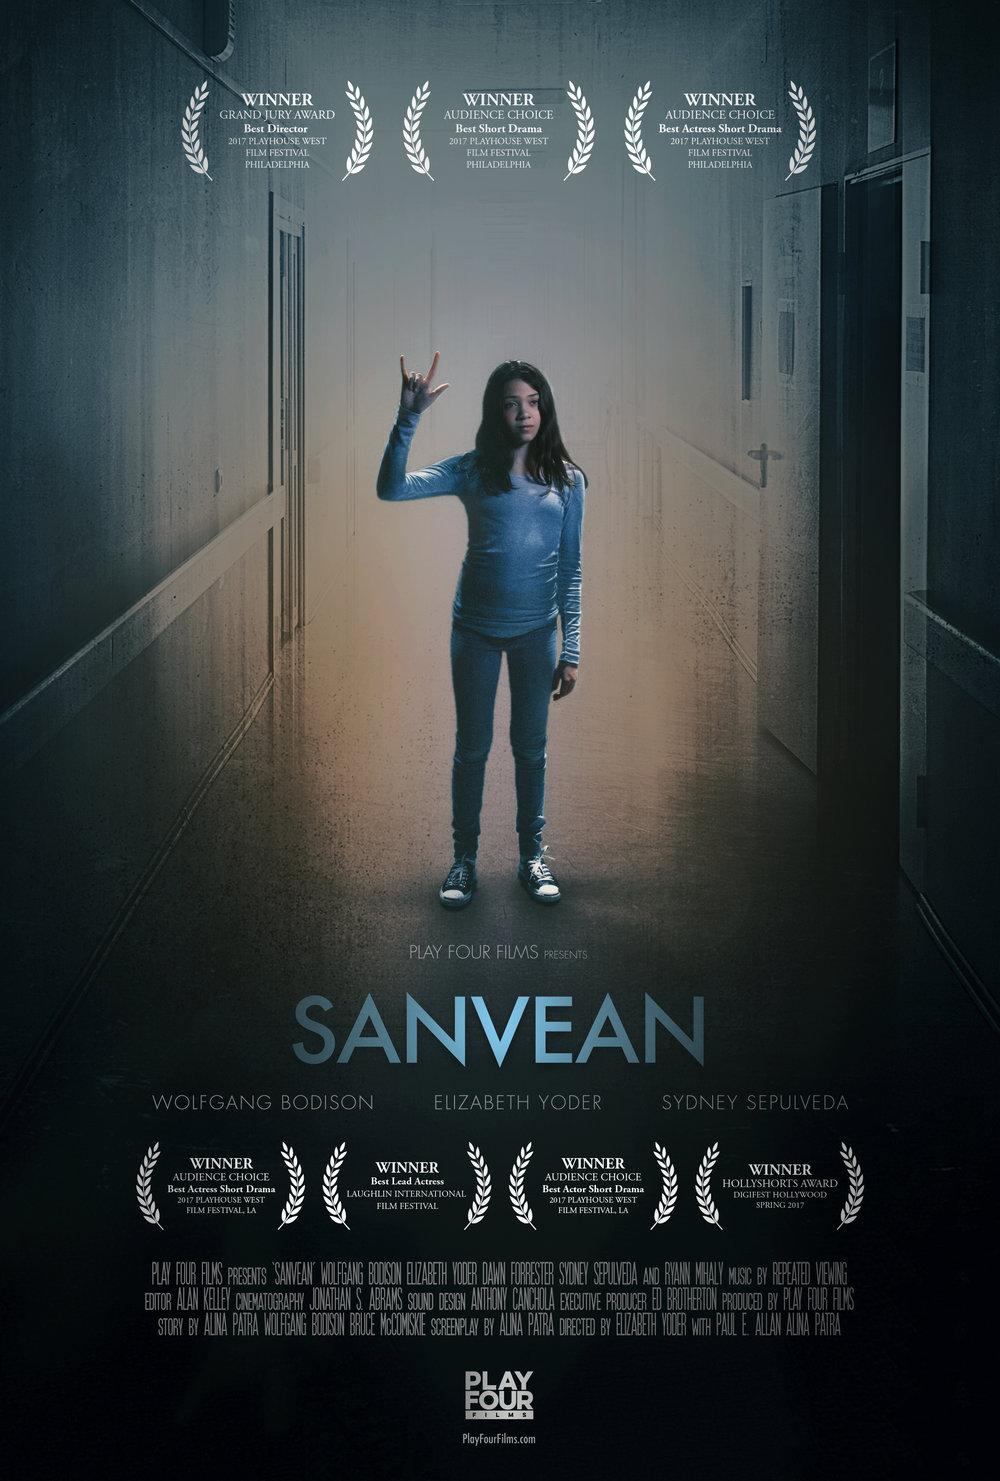 SanveanPoster2.jpg